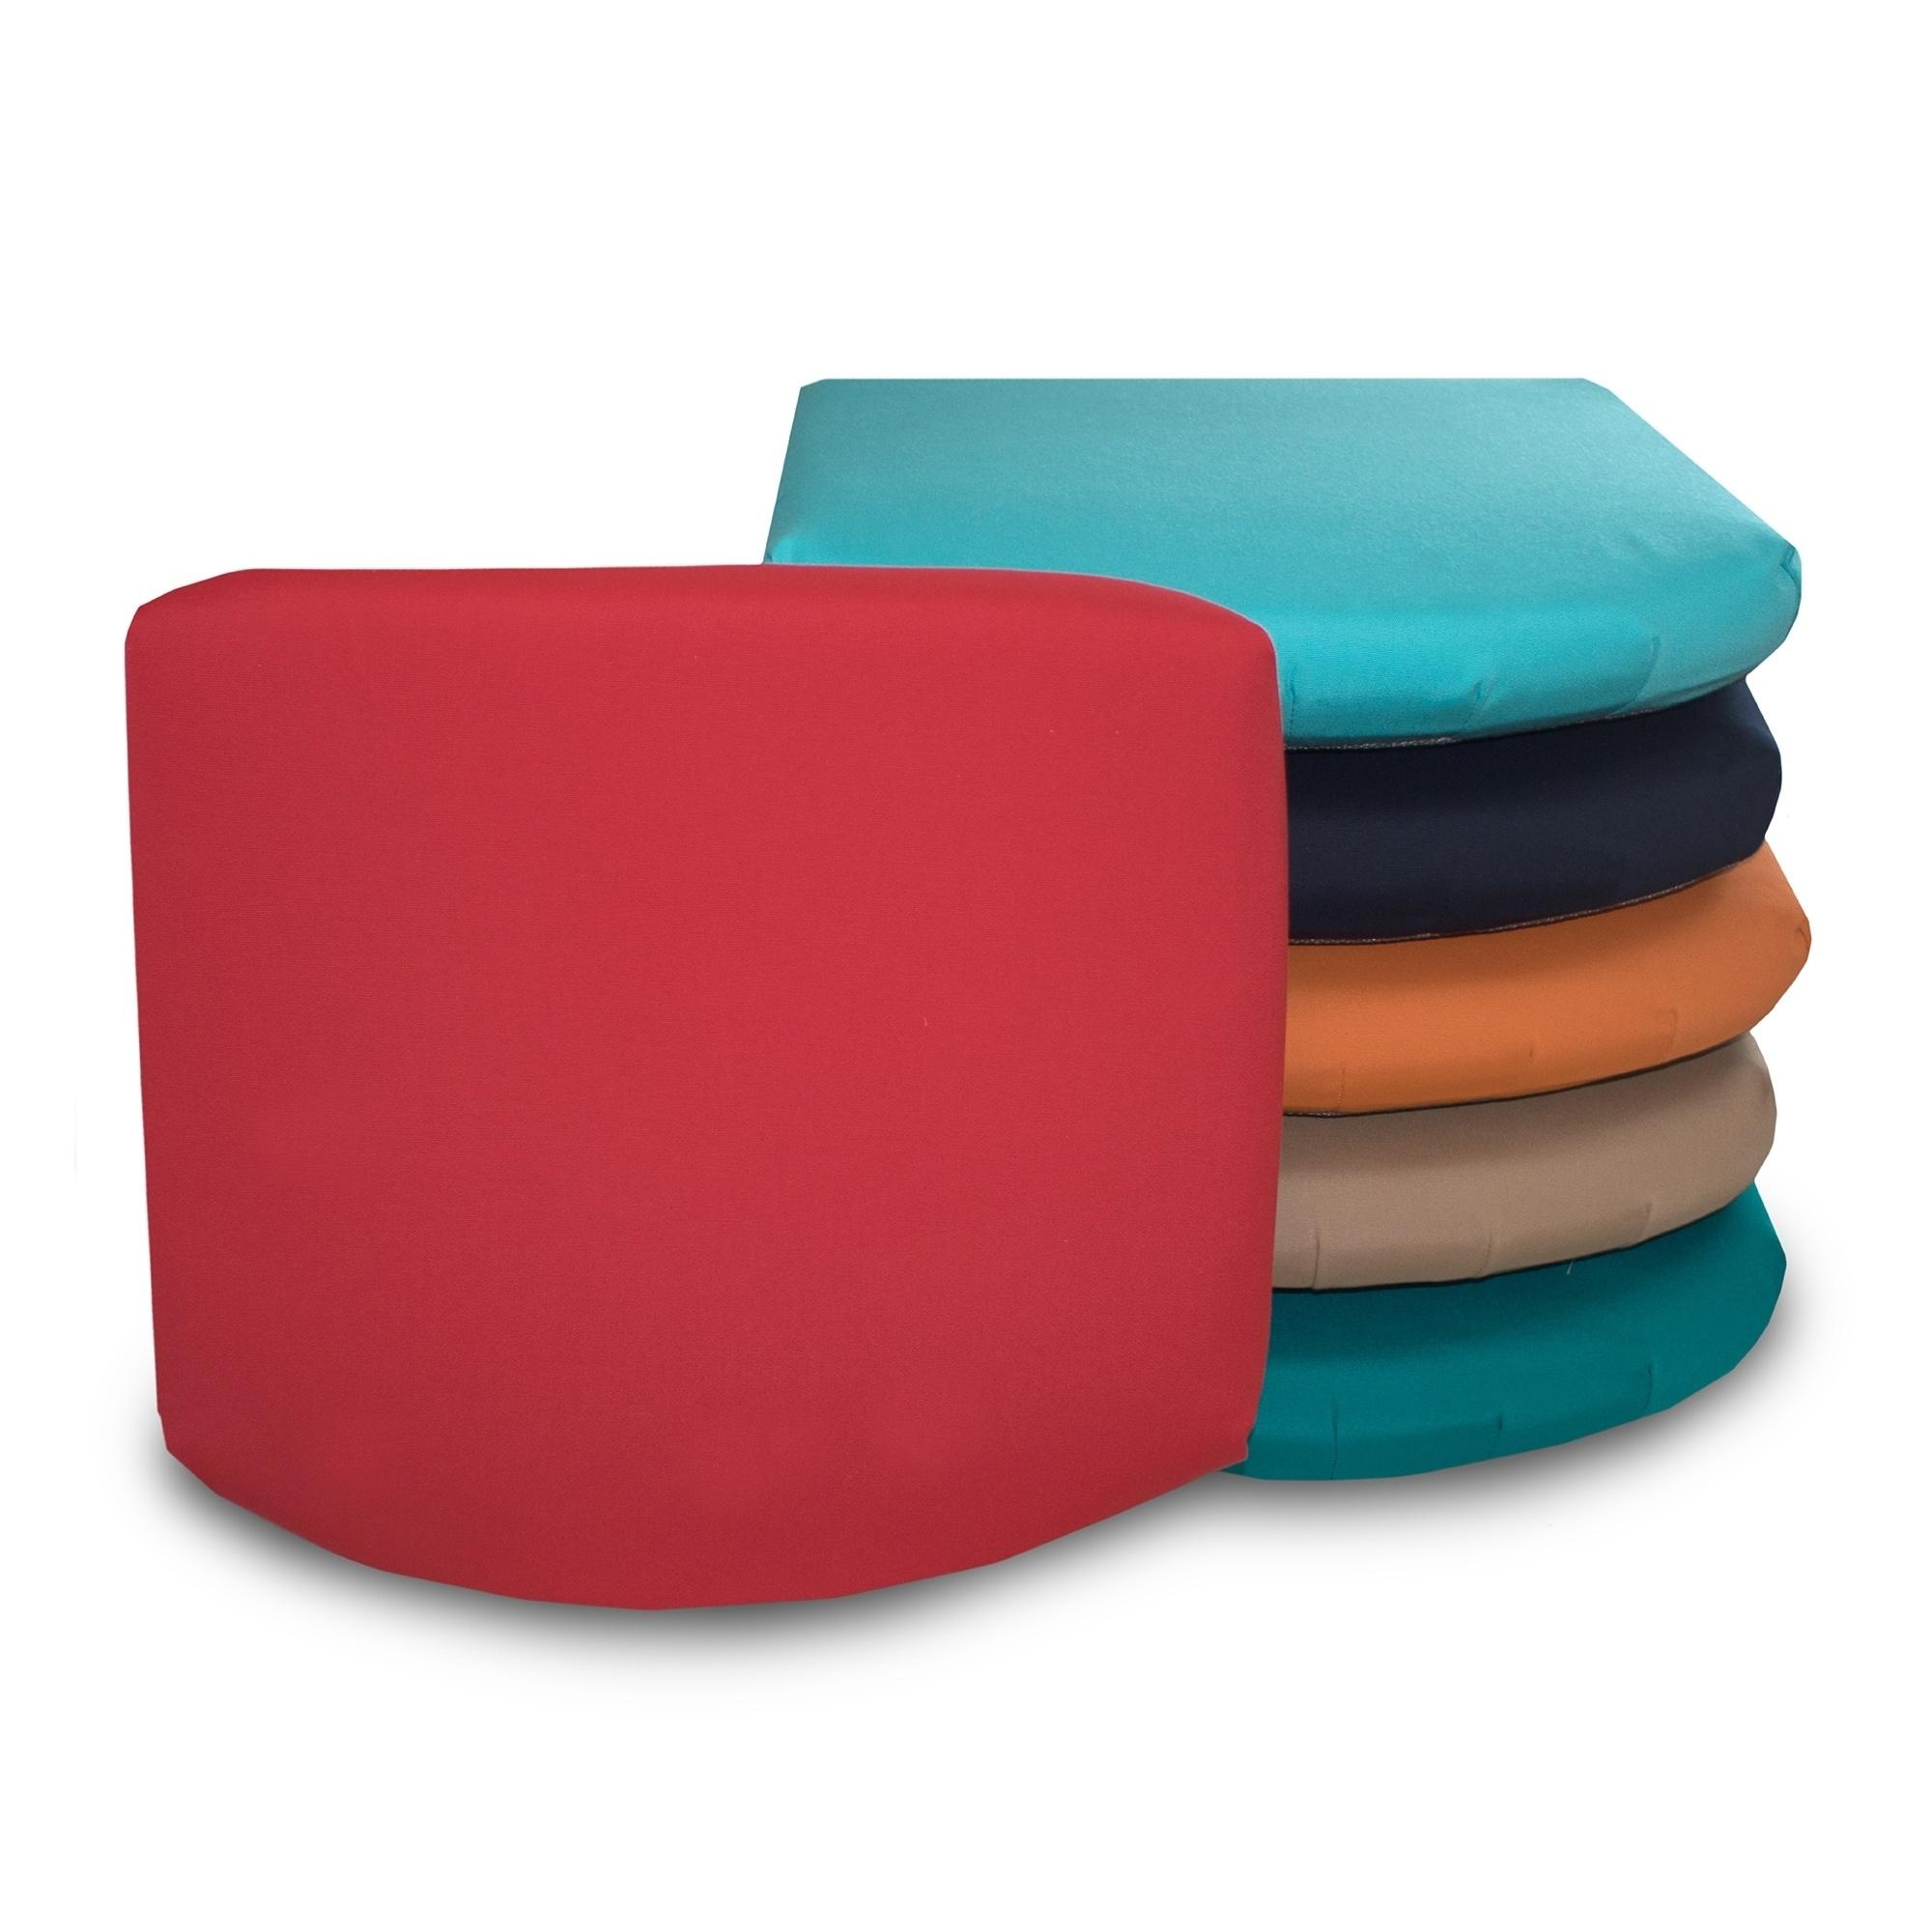 "18"" x 17"" Waterproof Sunbrella Memory Foam Seat Cushion - 18"